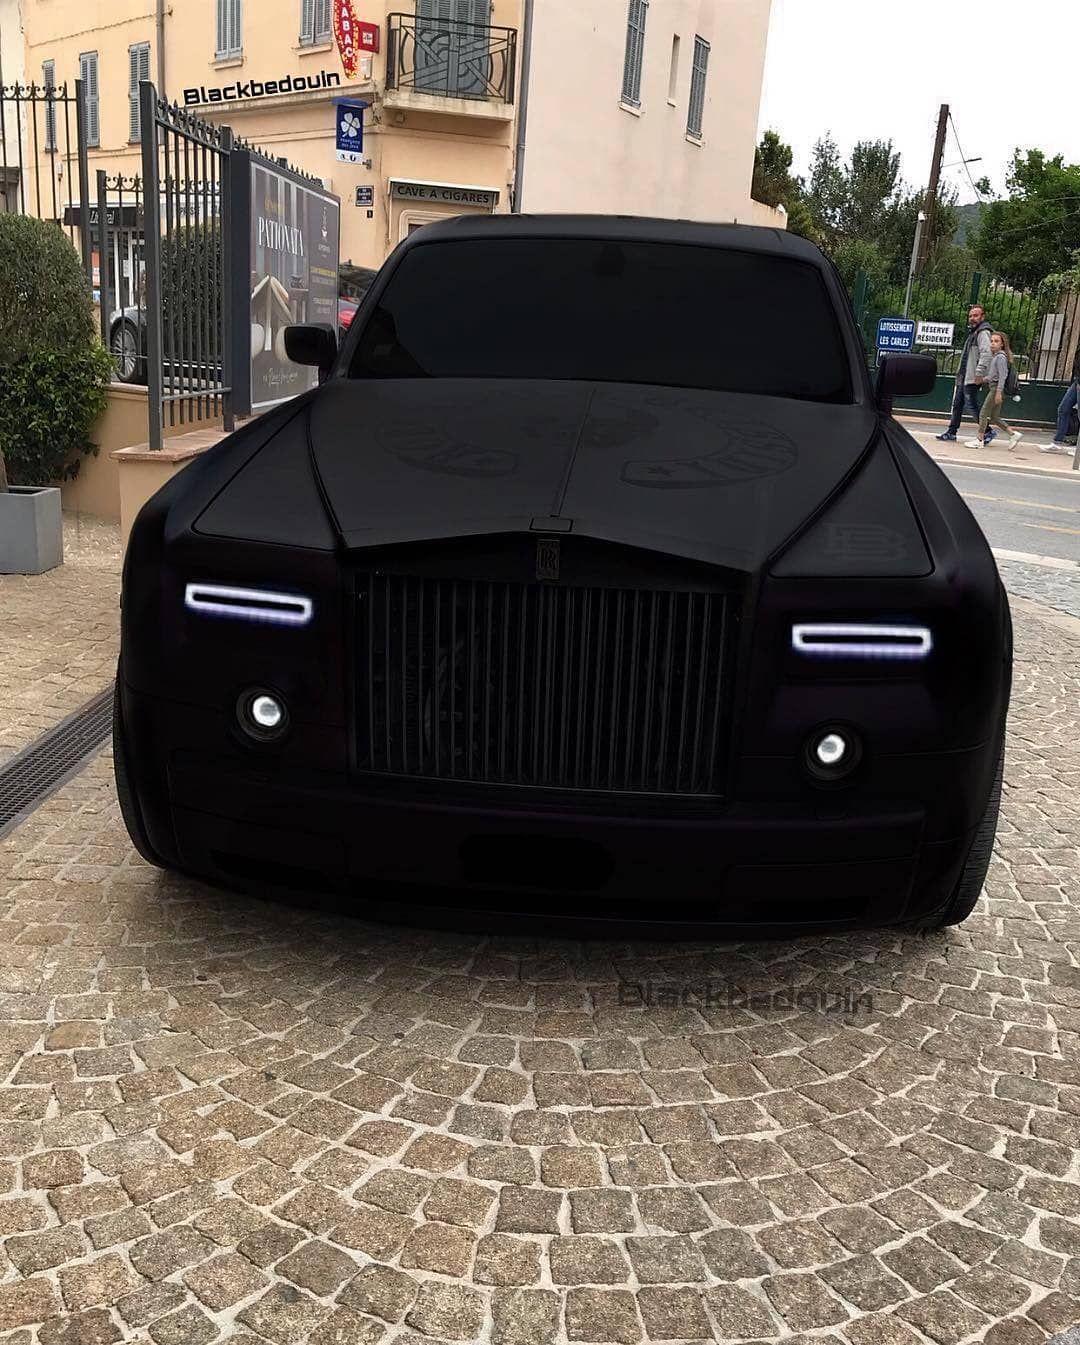 Blacked Out Rolls Royce Phantom Follow Supercarsbuzz For More Credits Tamar Turcsics Best Luxury Cars Luxury Cars Rolls Royce Rolls Royce Phantom